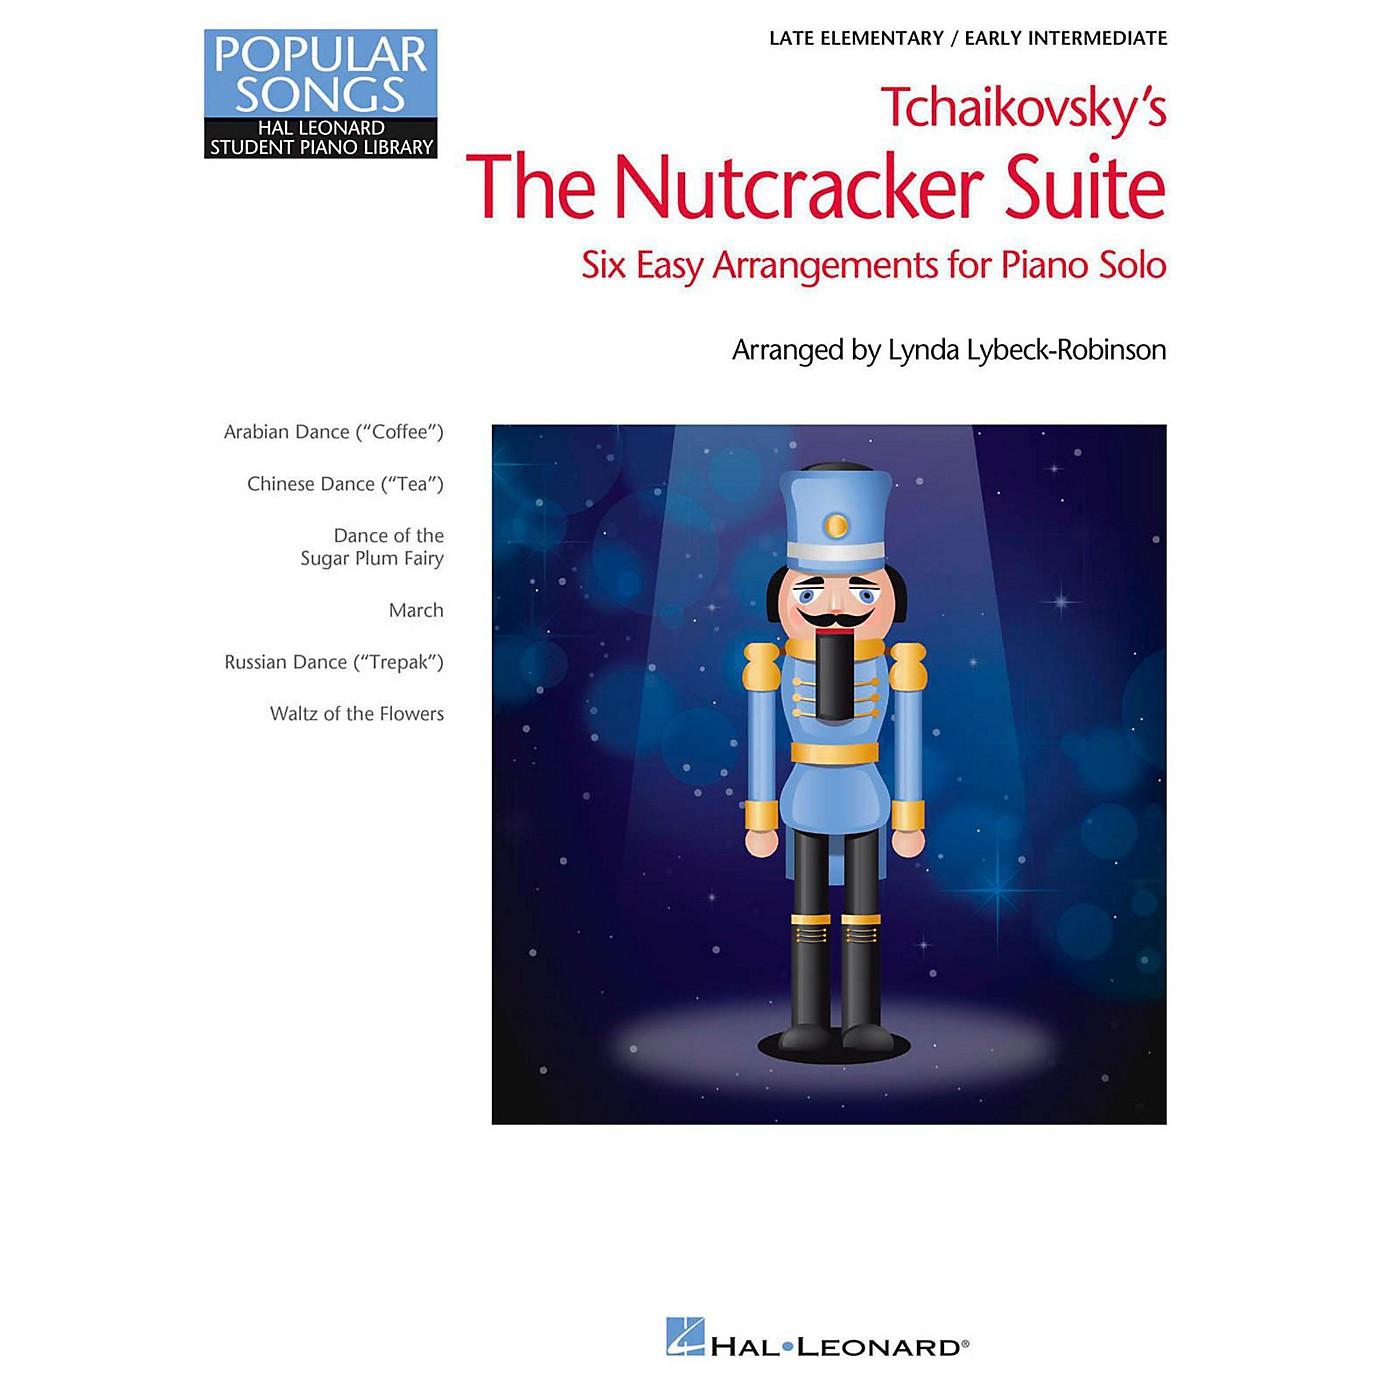 Hal Leonard Nutcracker Suite Selections - Popular Songs Series Early Intermediate Piano Solo thumbnail